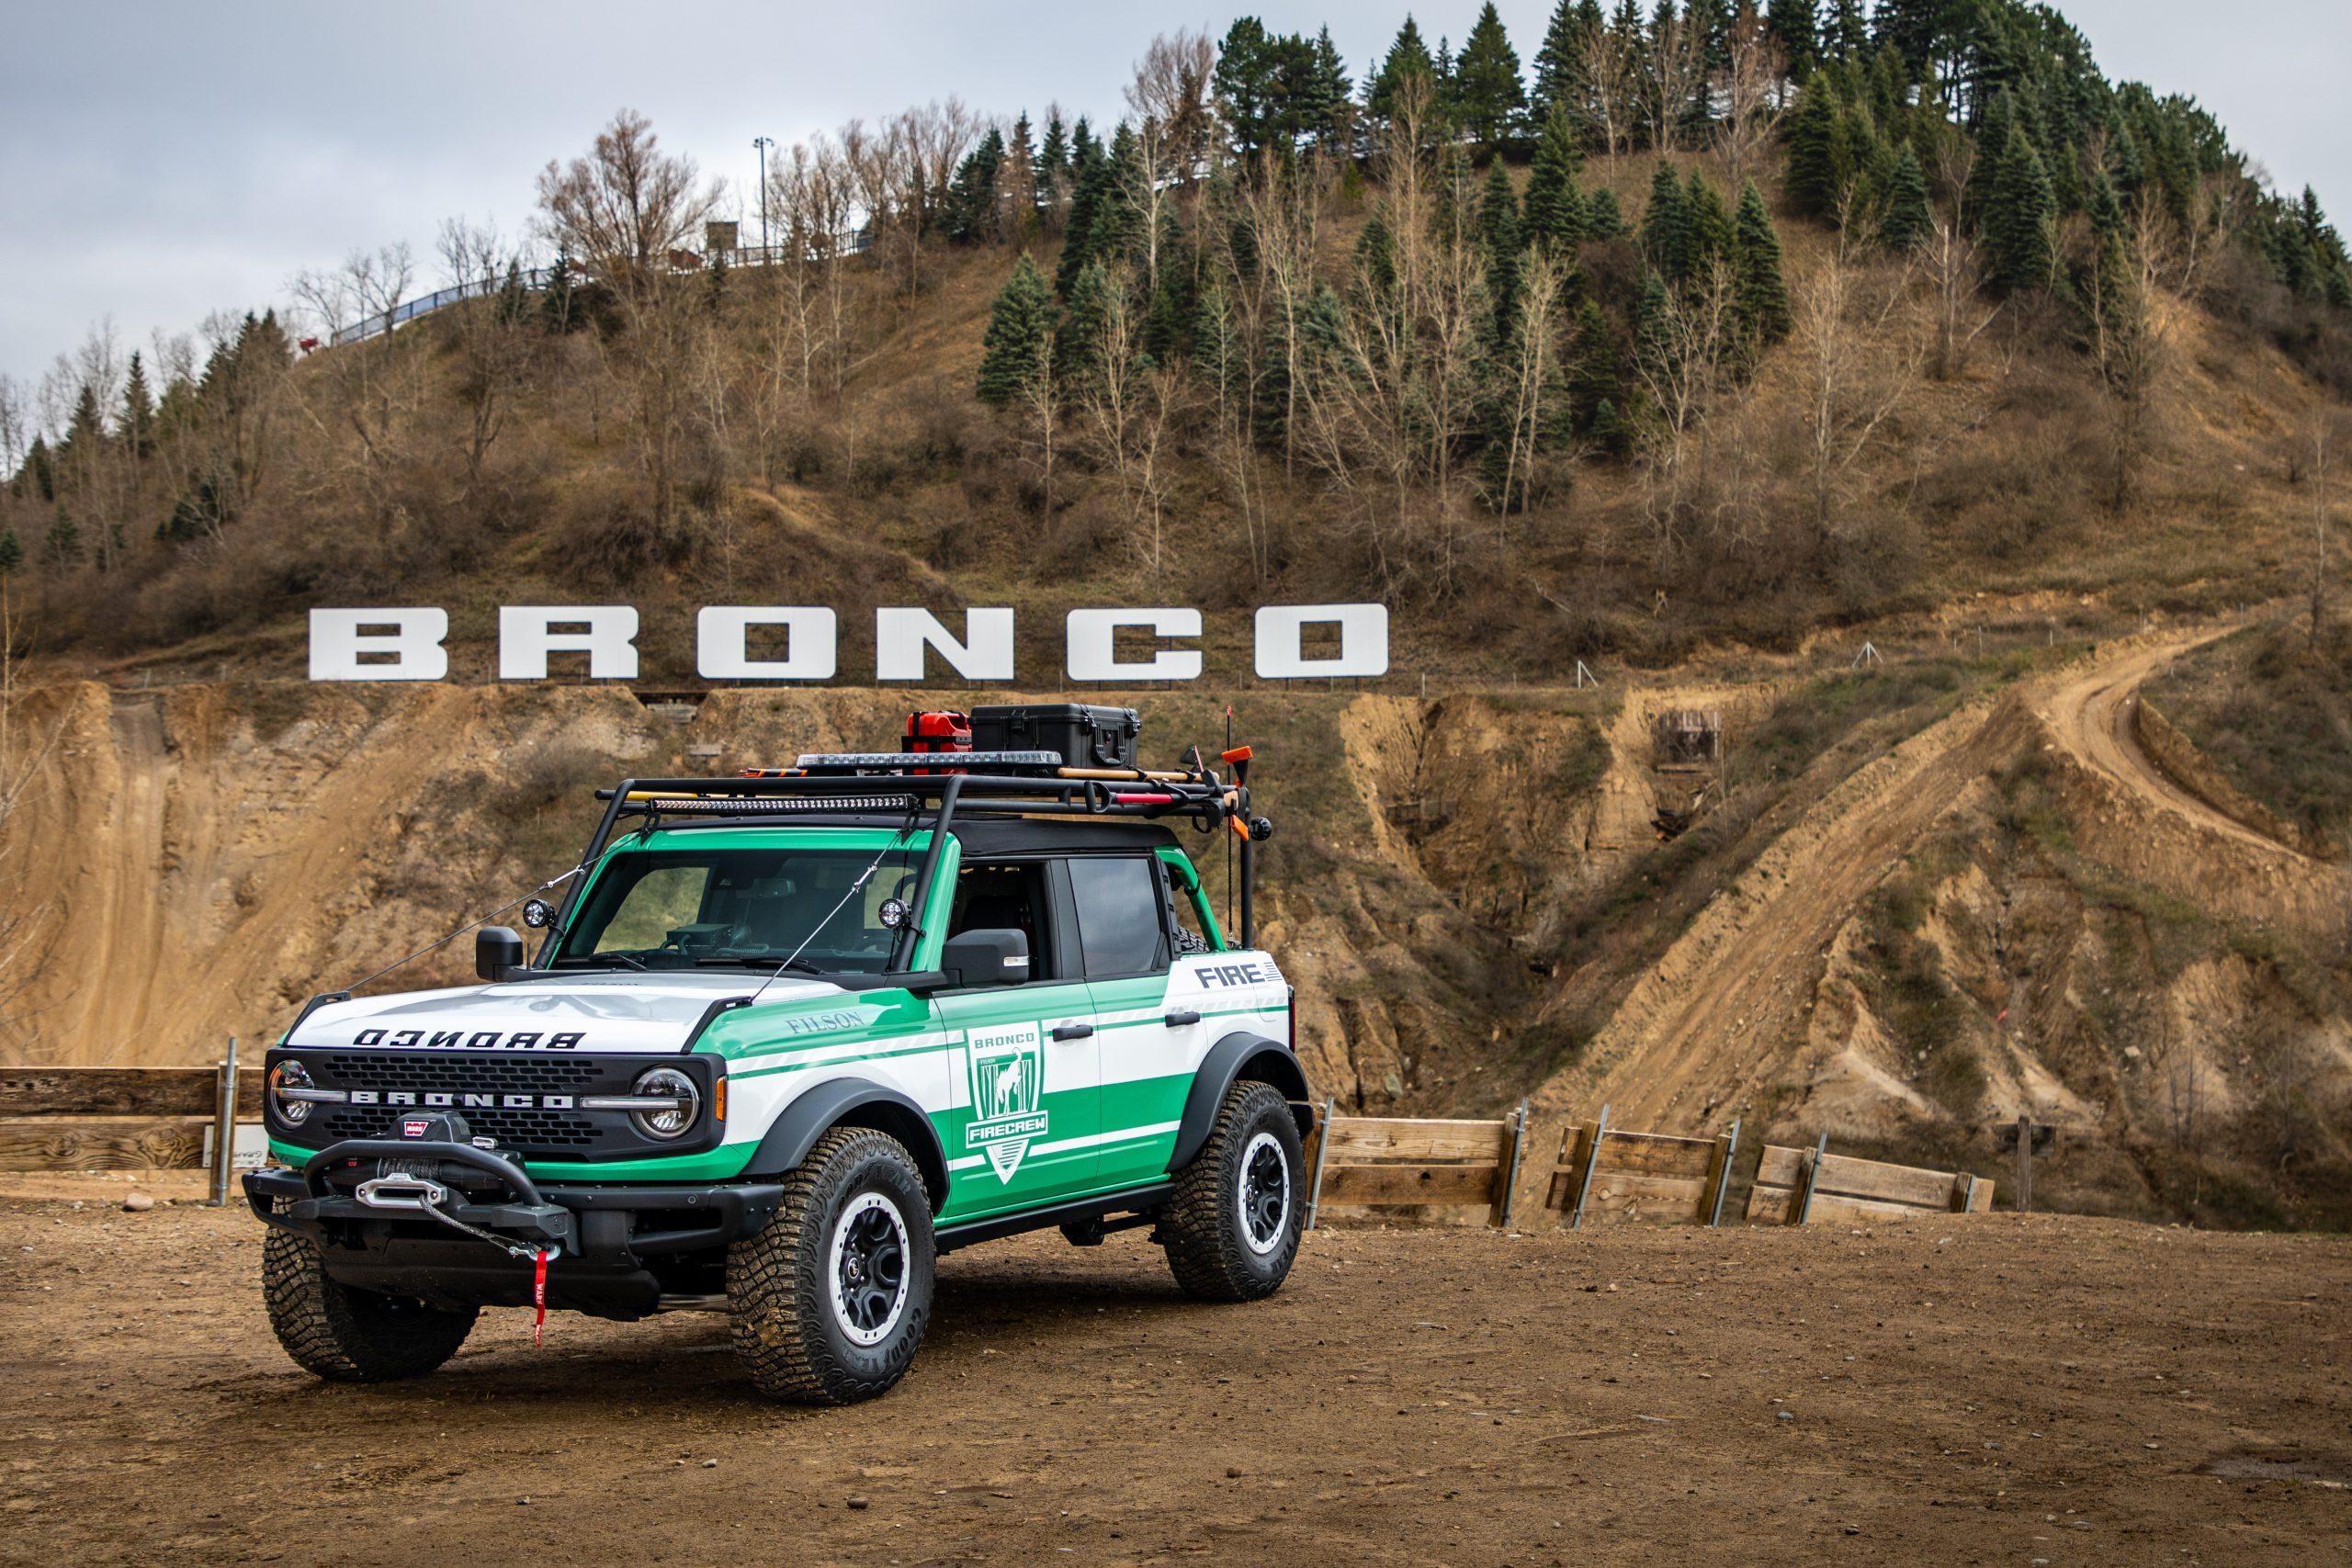 Ford Bronco Filson edition